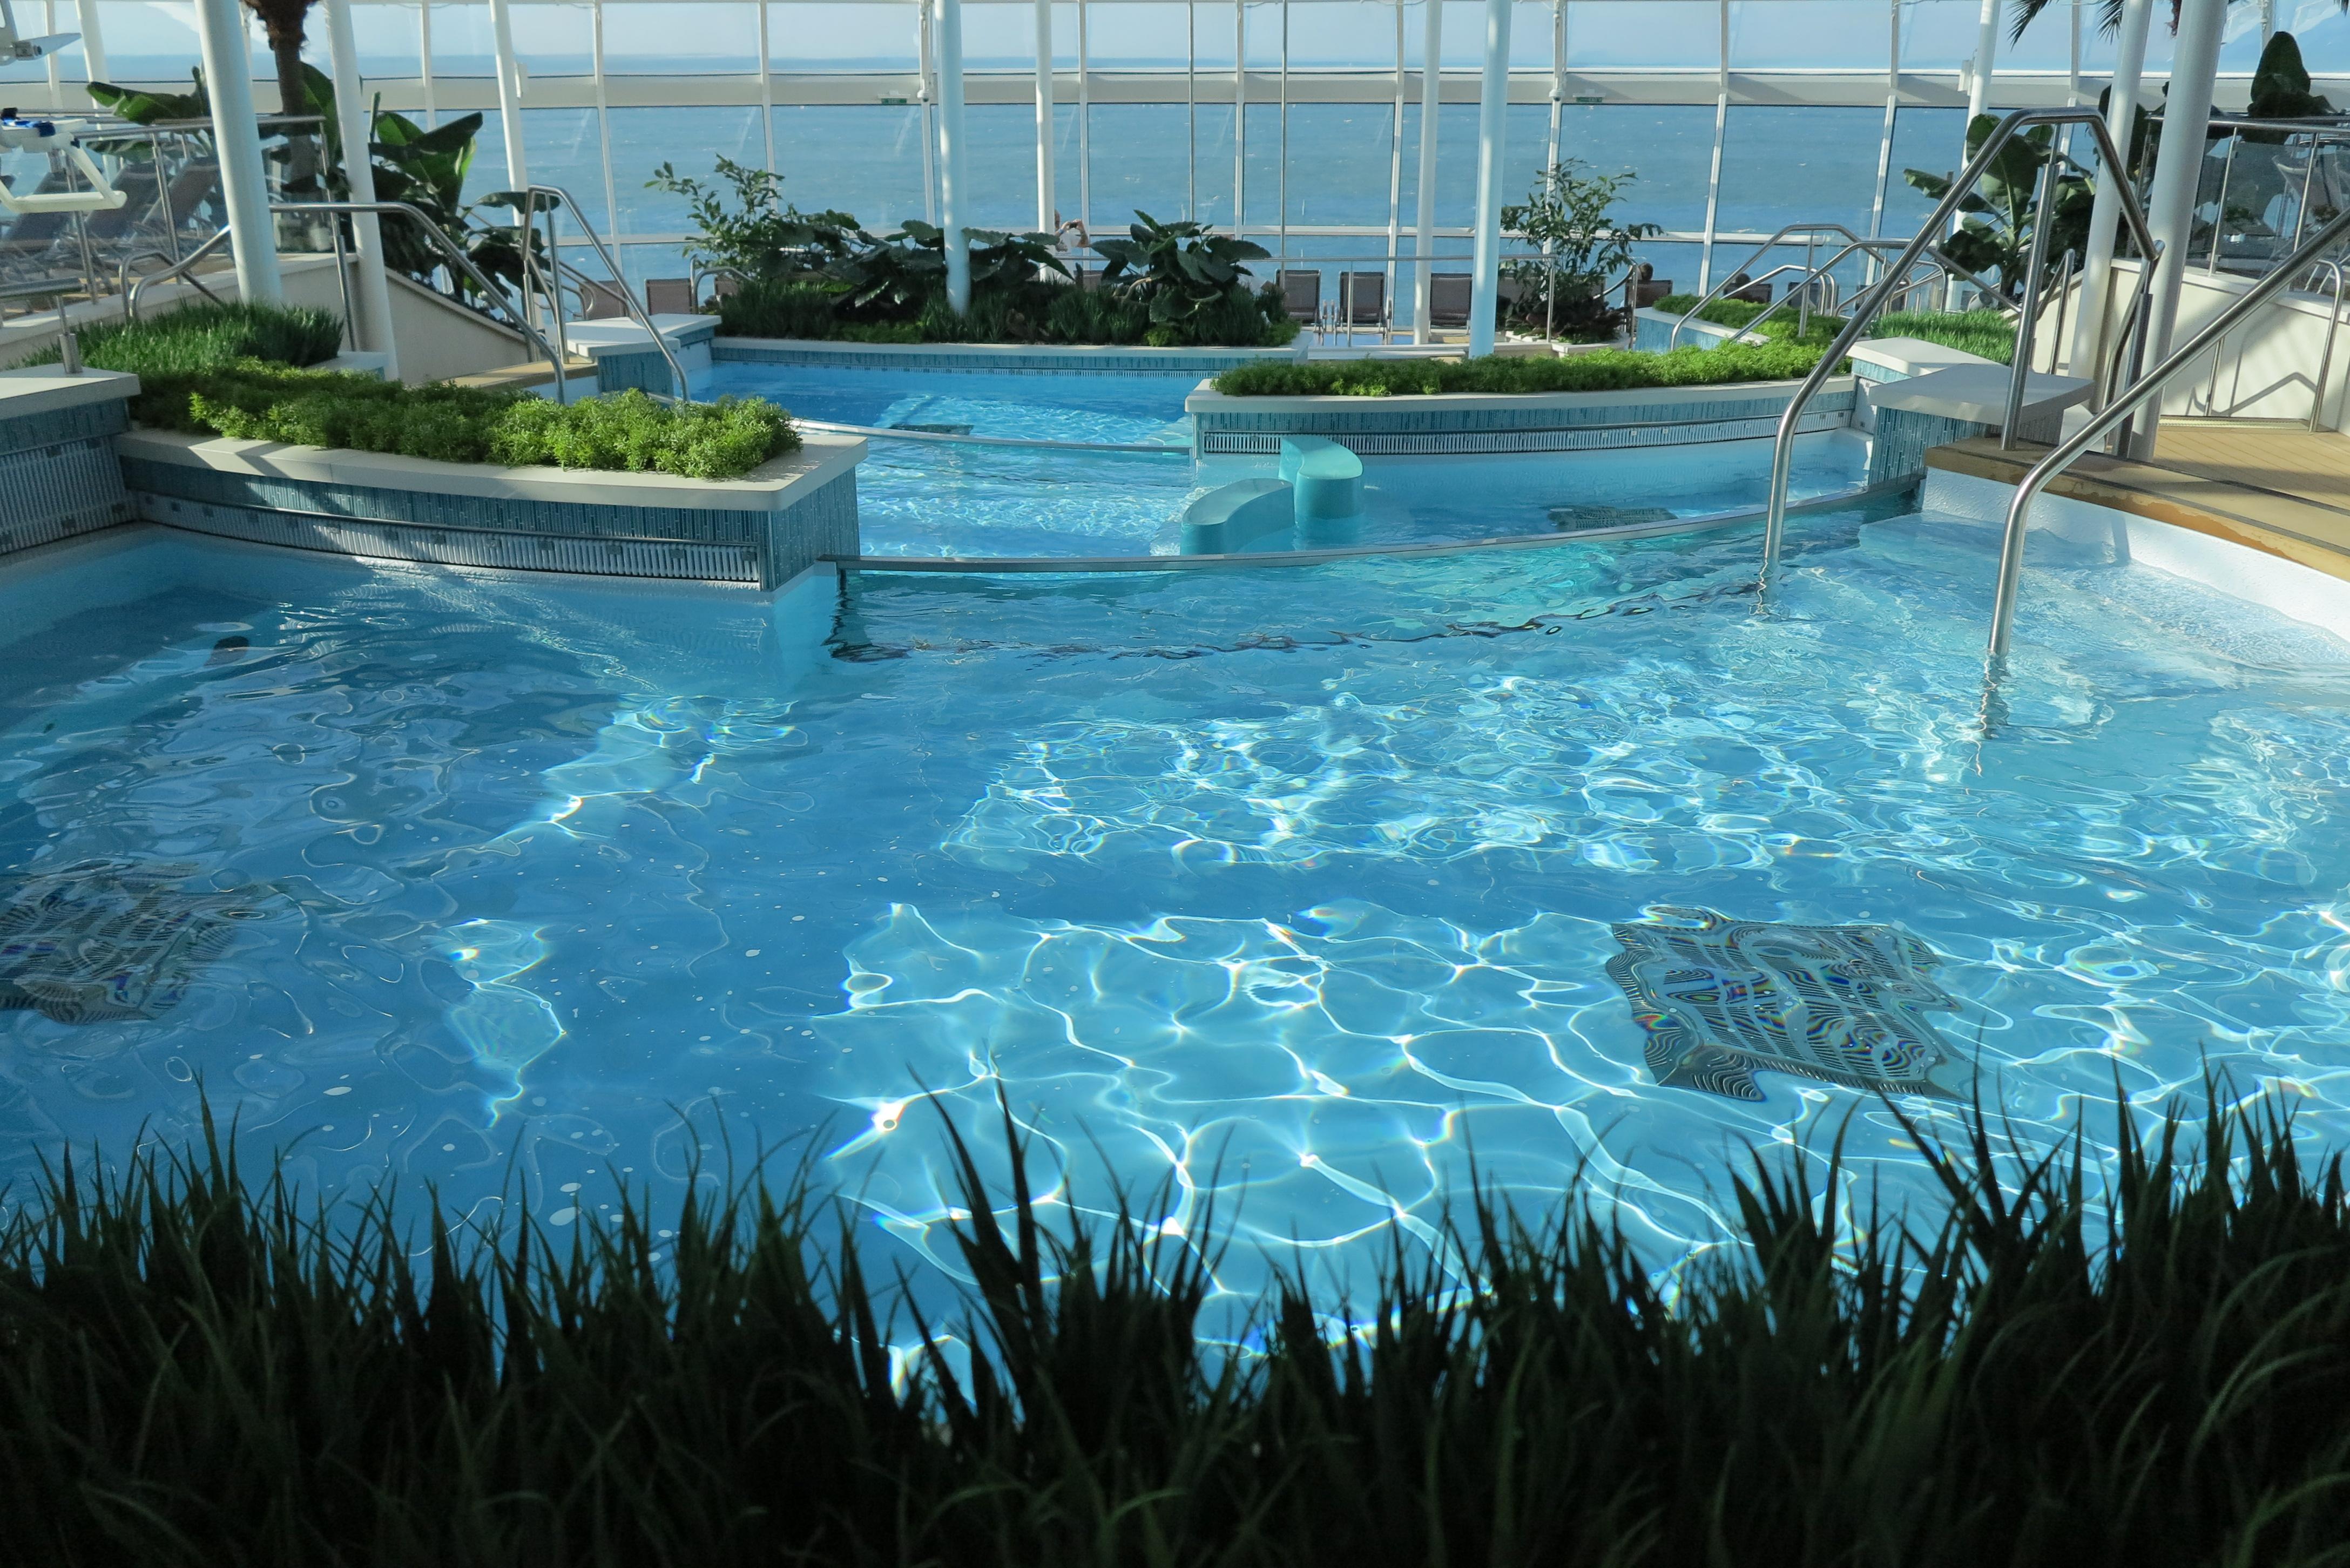 Water feature: Pools in the Solarium